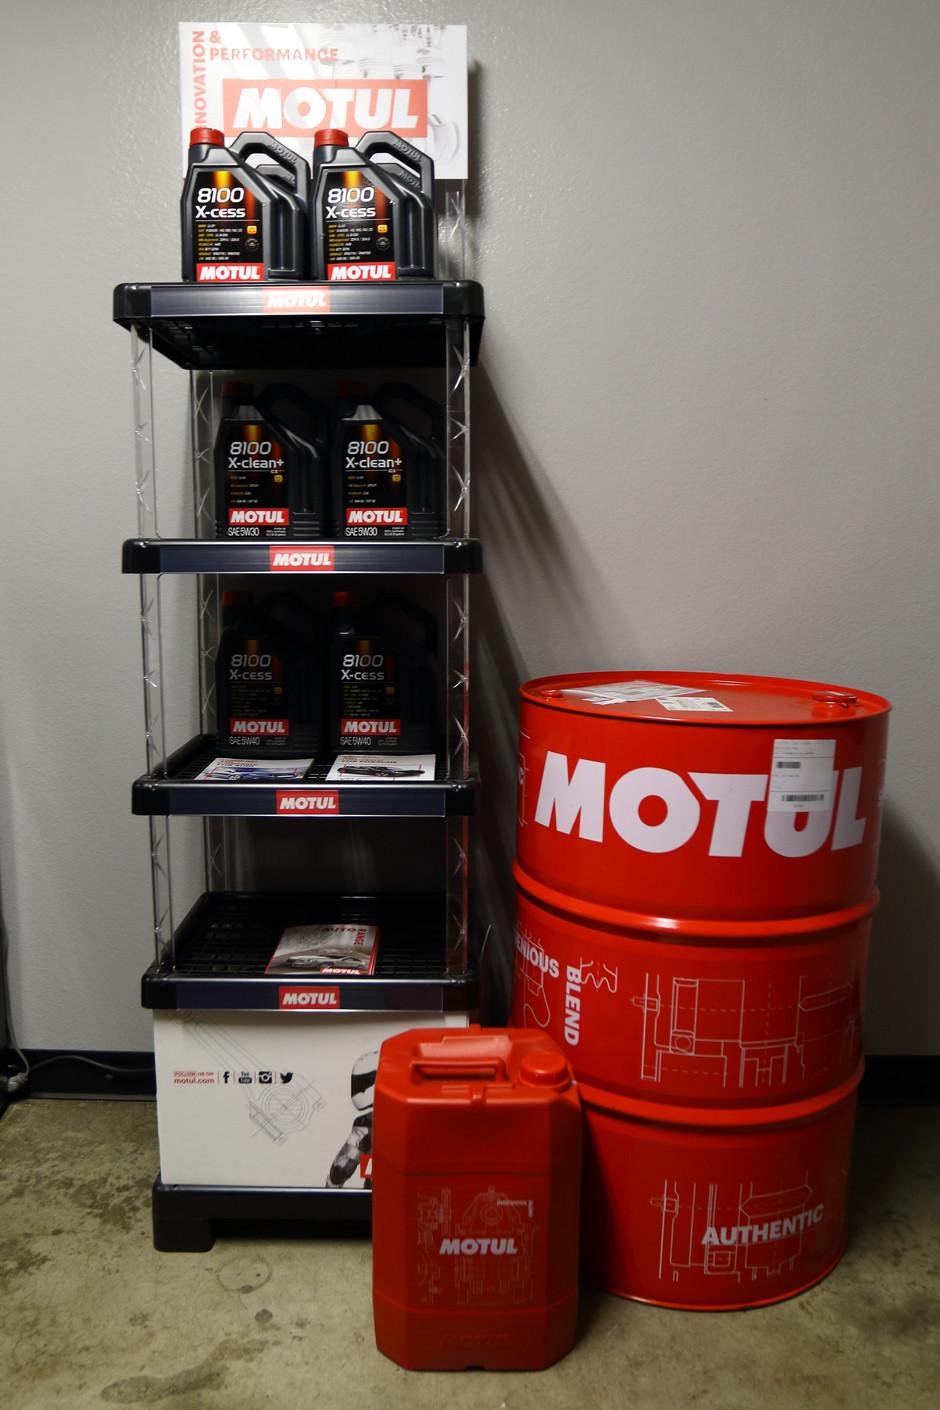 Motul Premium Synthetic Engine Oil in Stock